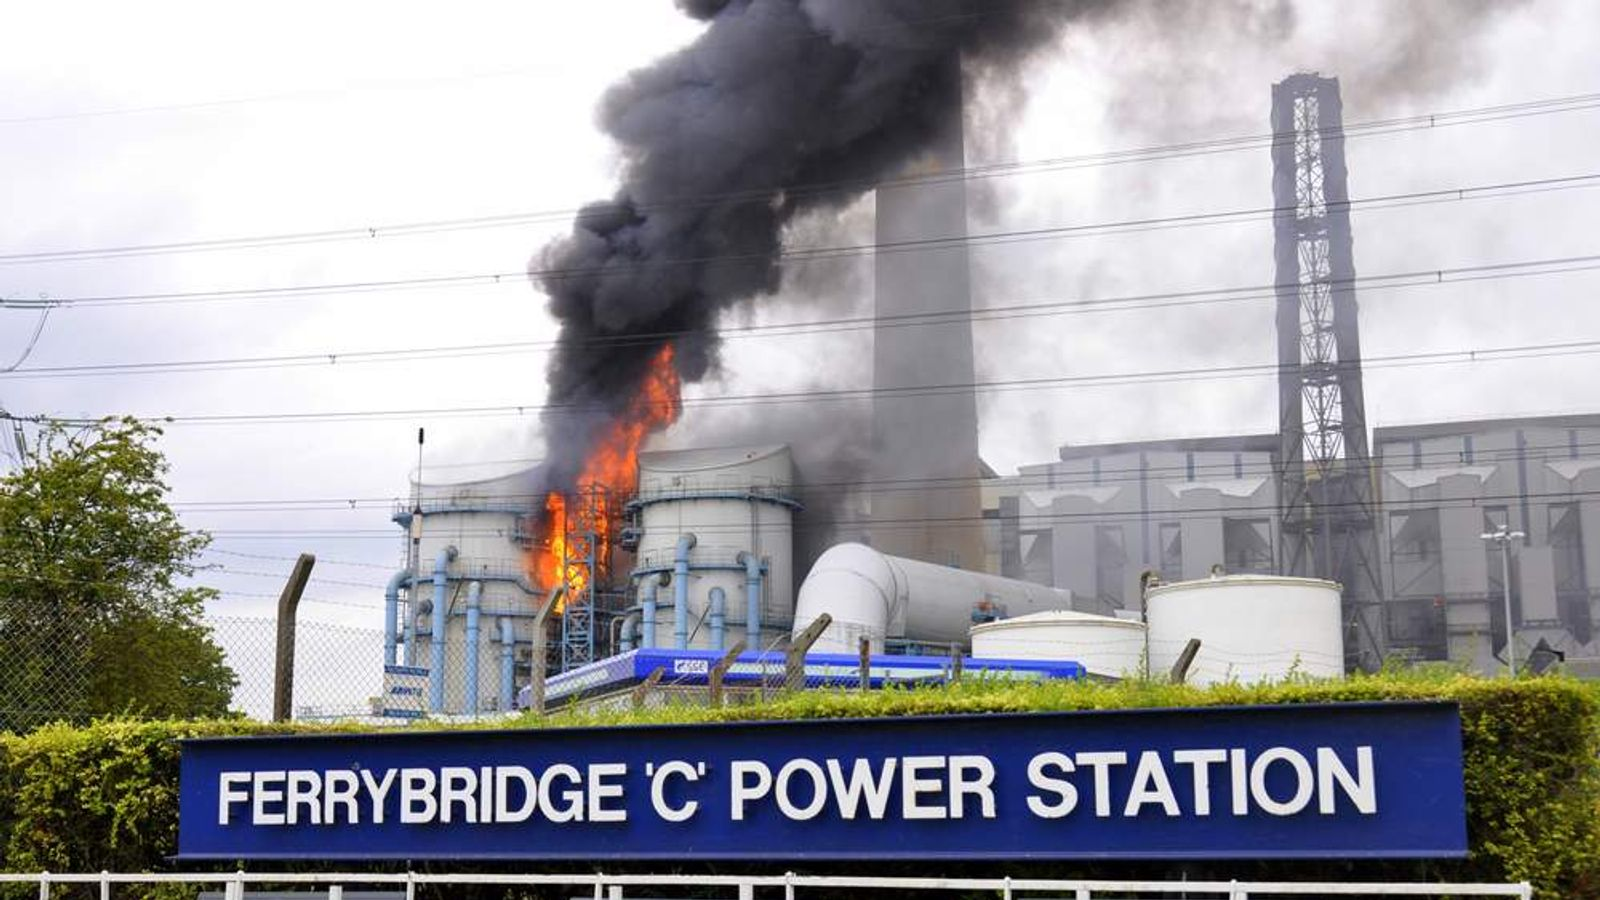 Ferrybridge power station fire. Pic: Matthew Merrick.